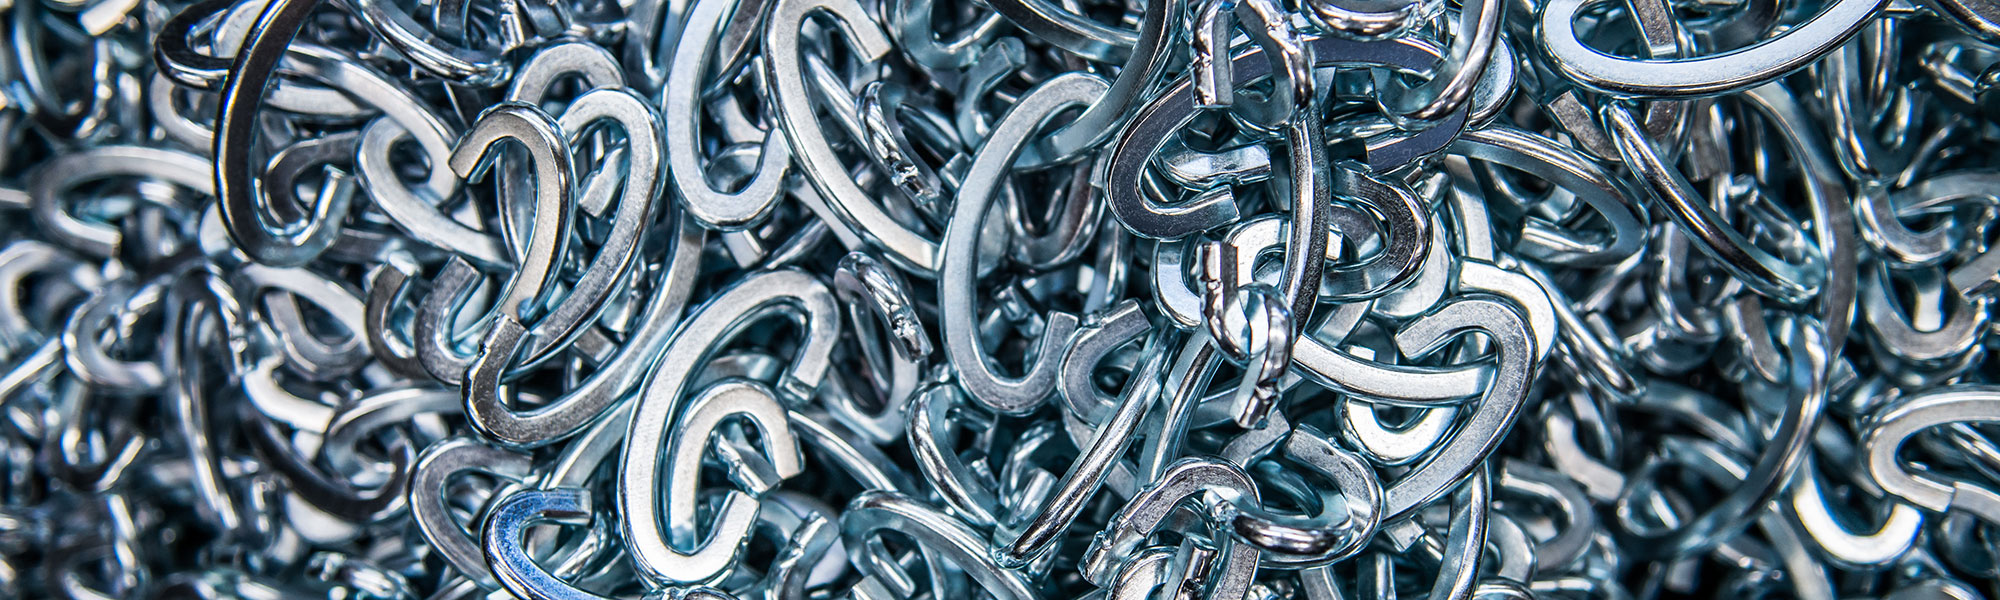 Particolari metallici per forme di calzature - Gima Spa